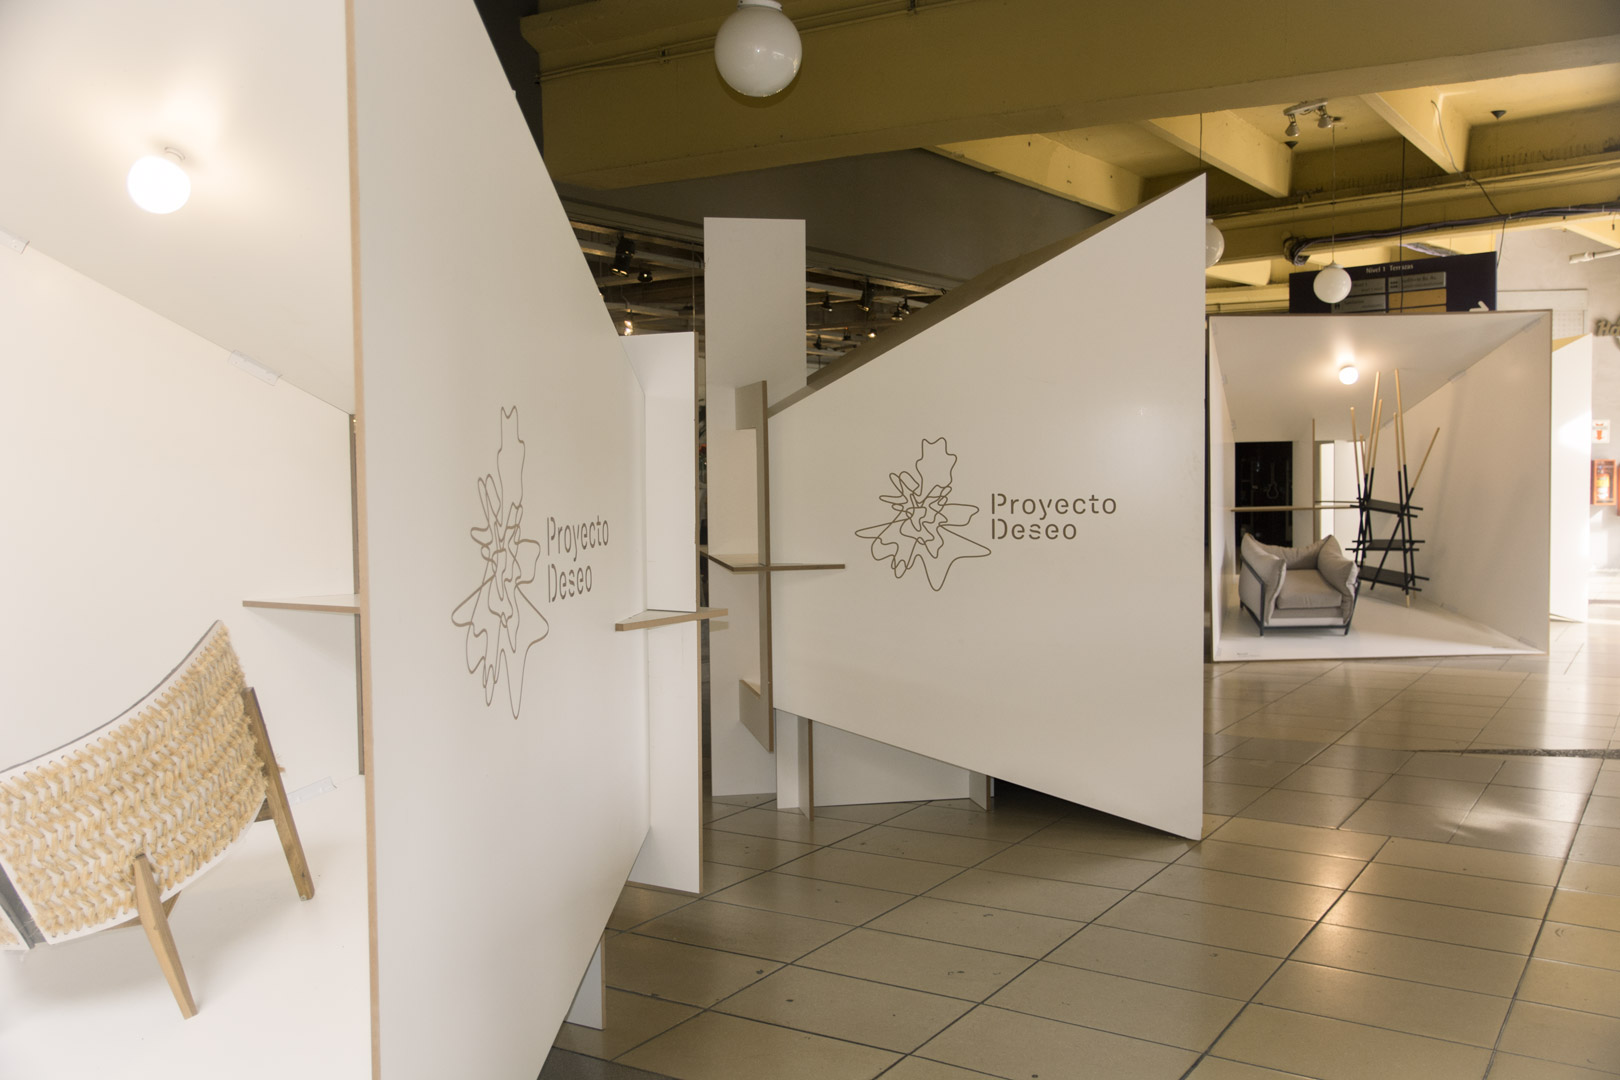 Exhibición muebles Proyecto Deseo Buenos Aires design